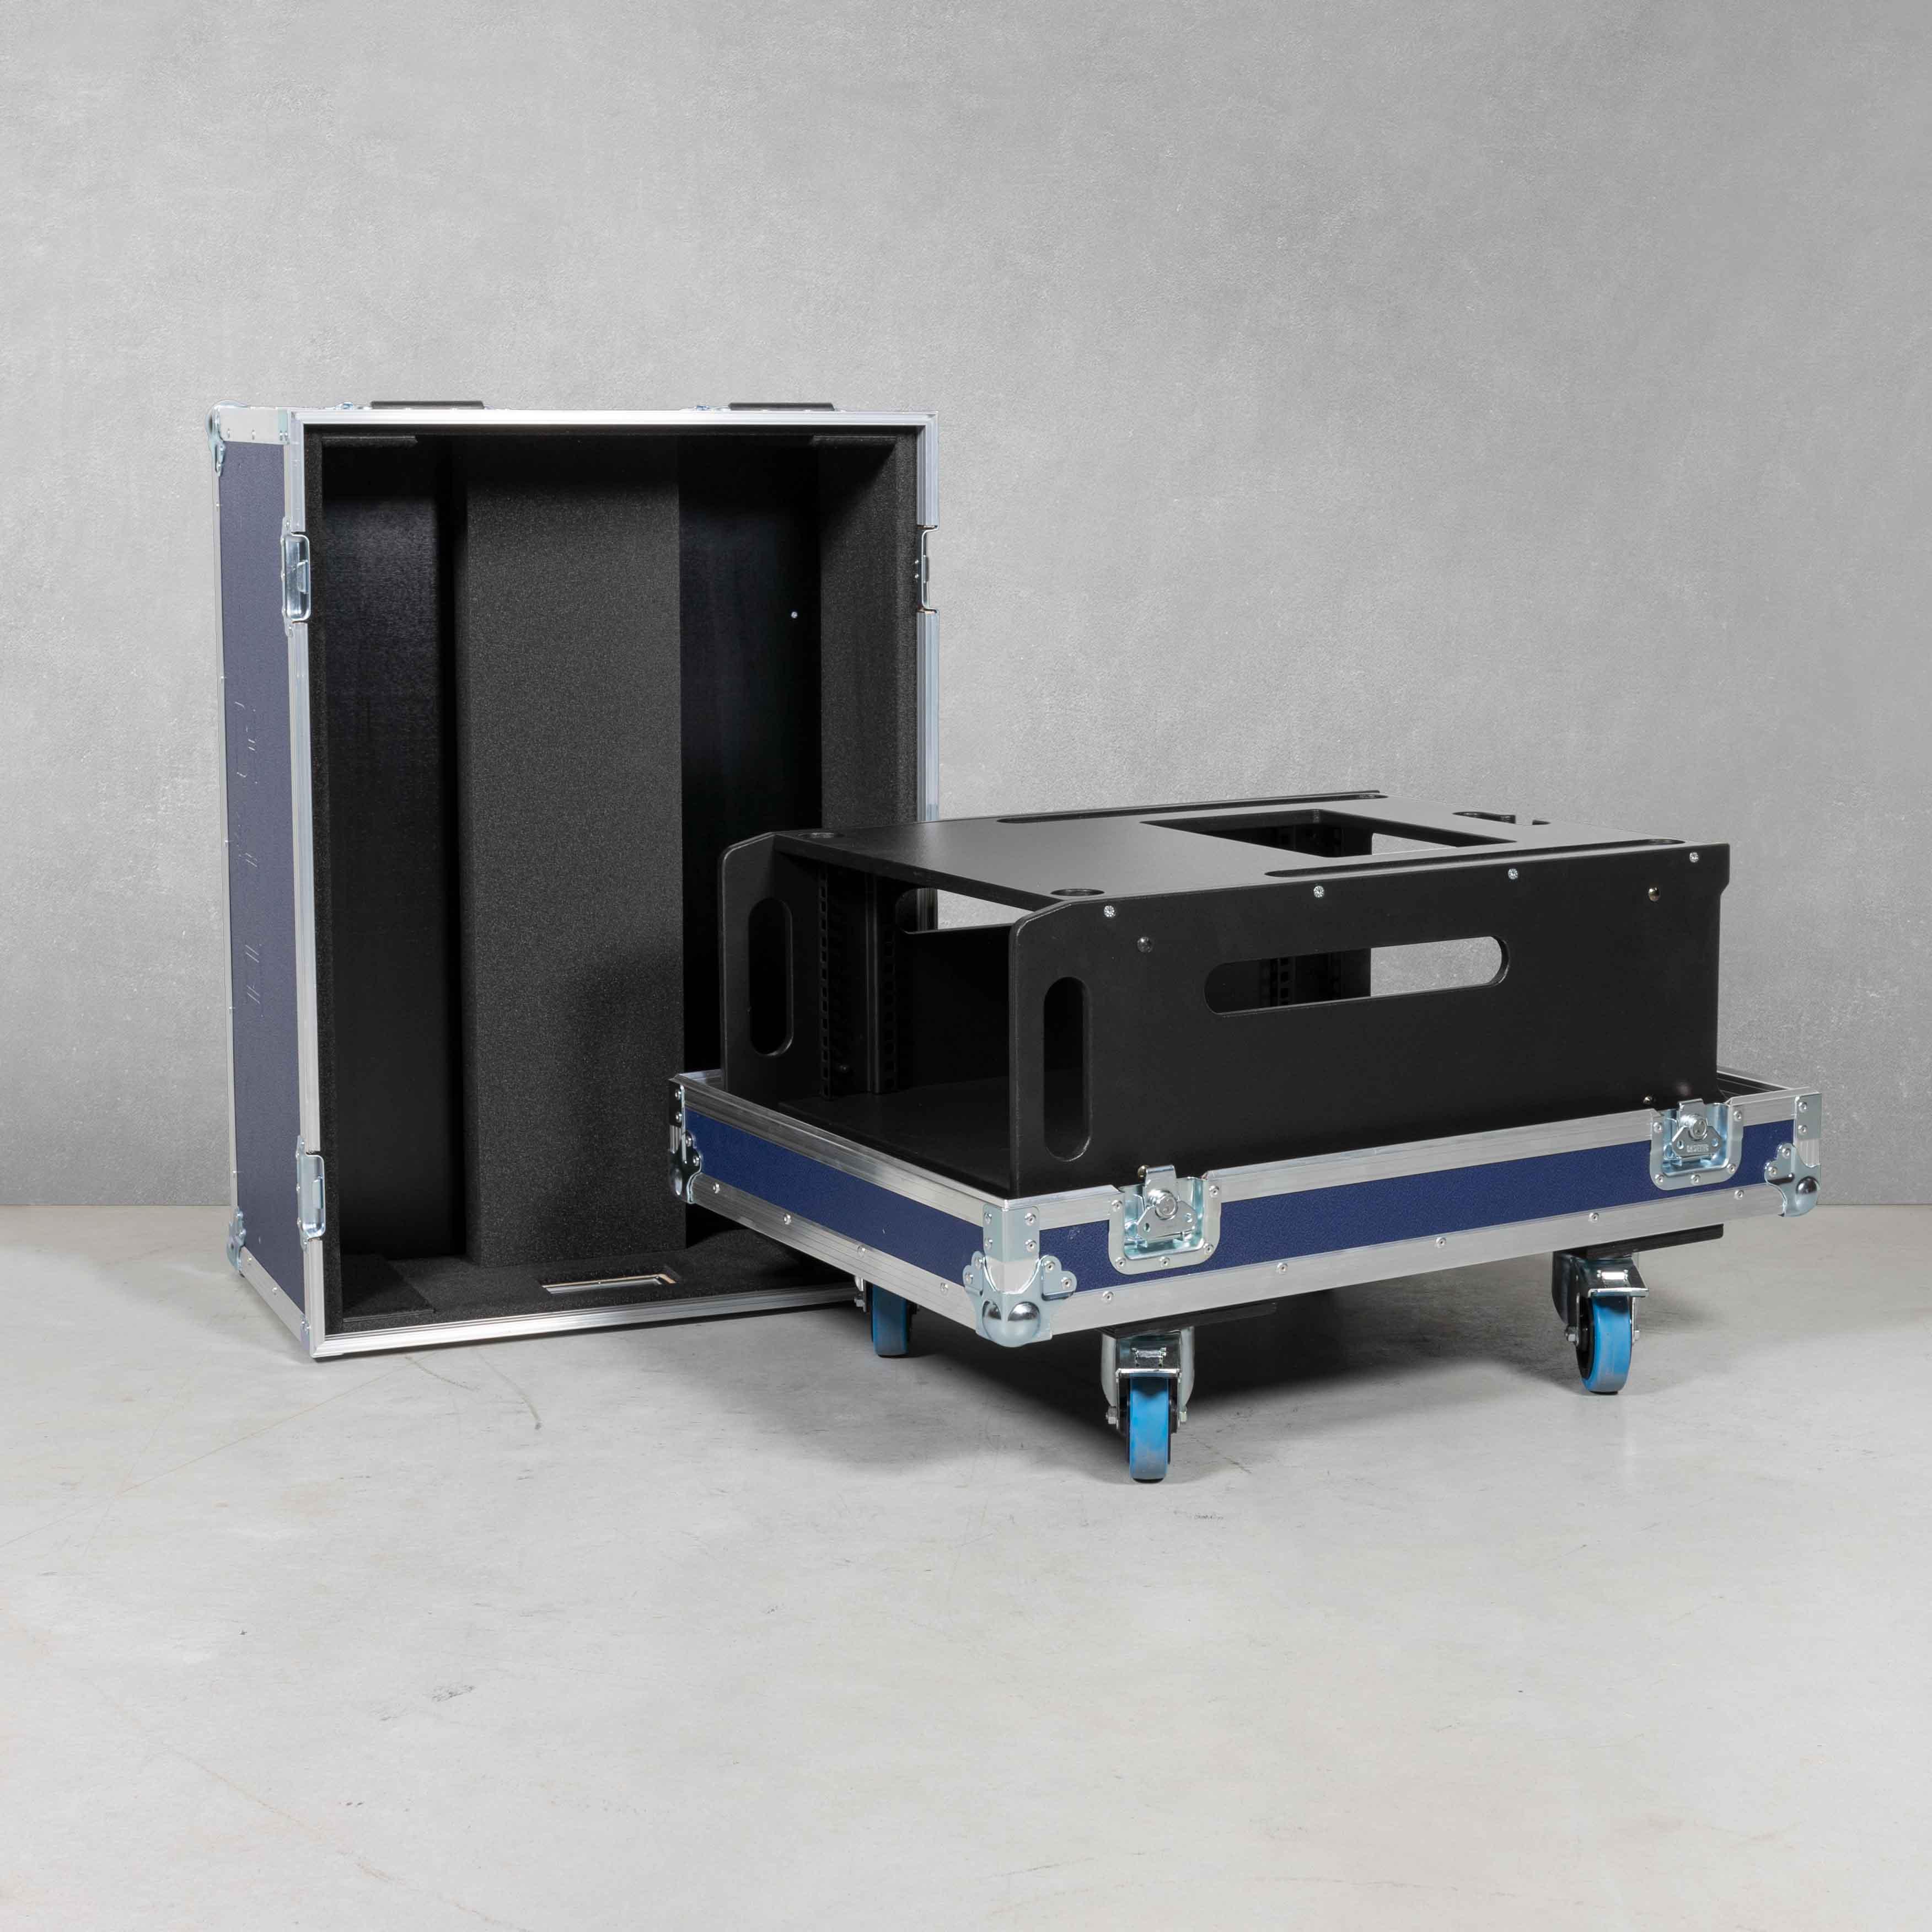 Haubencase für Studiorack 5 HE (Ross Carbonite Ultra3M)